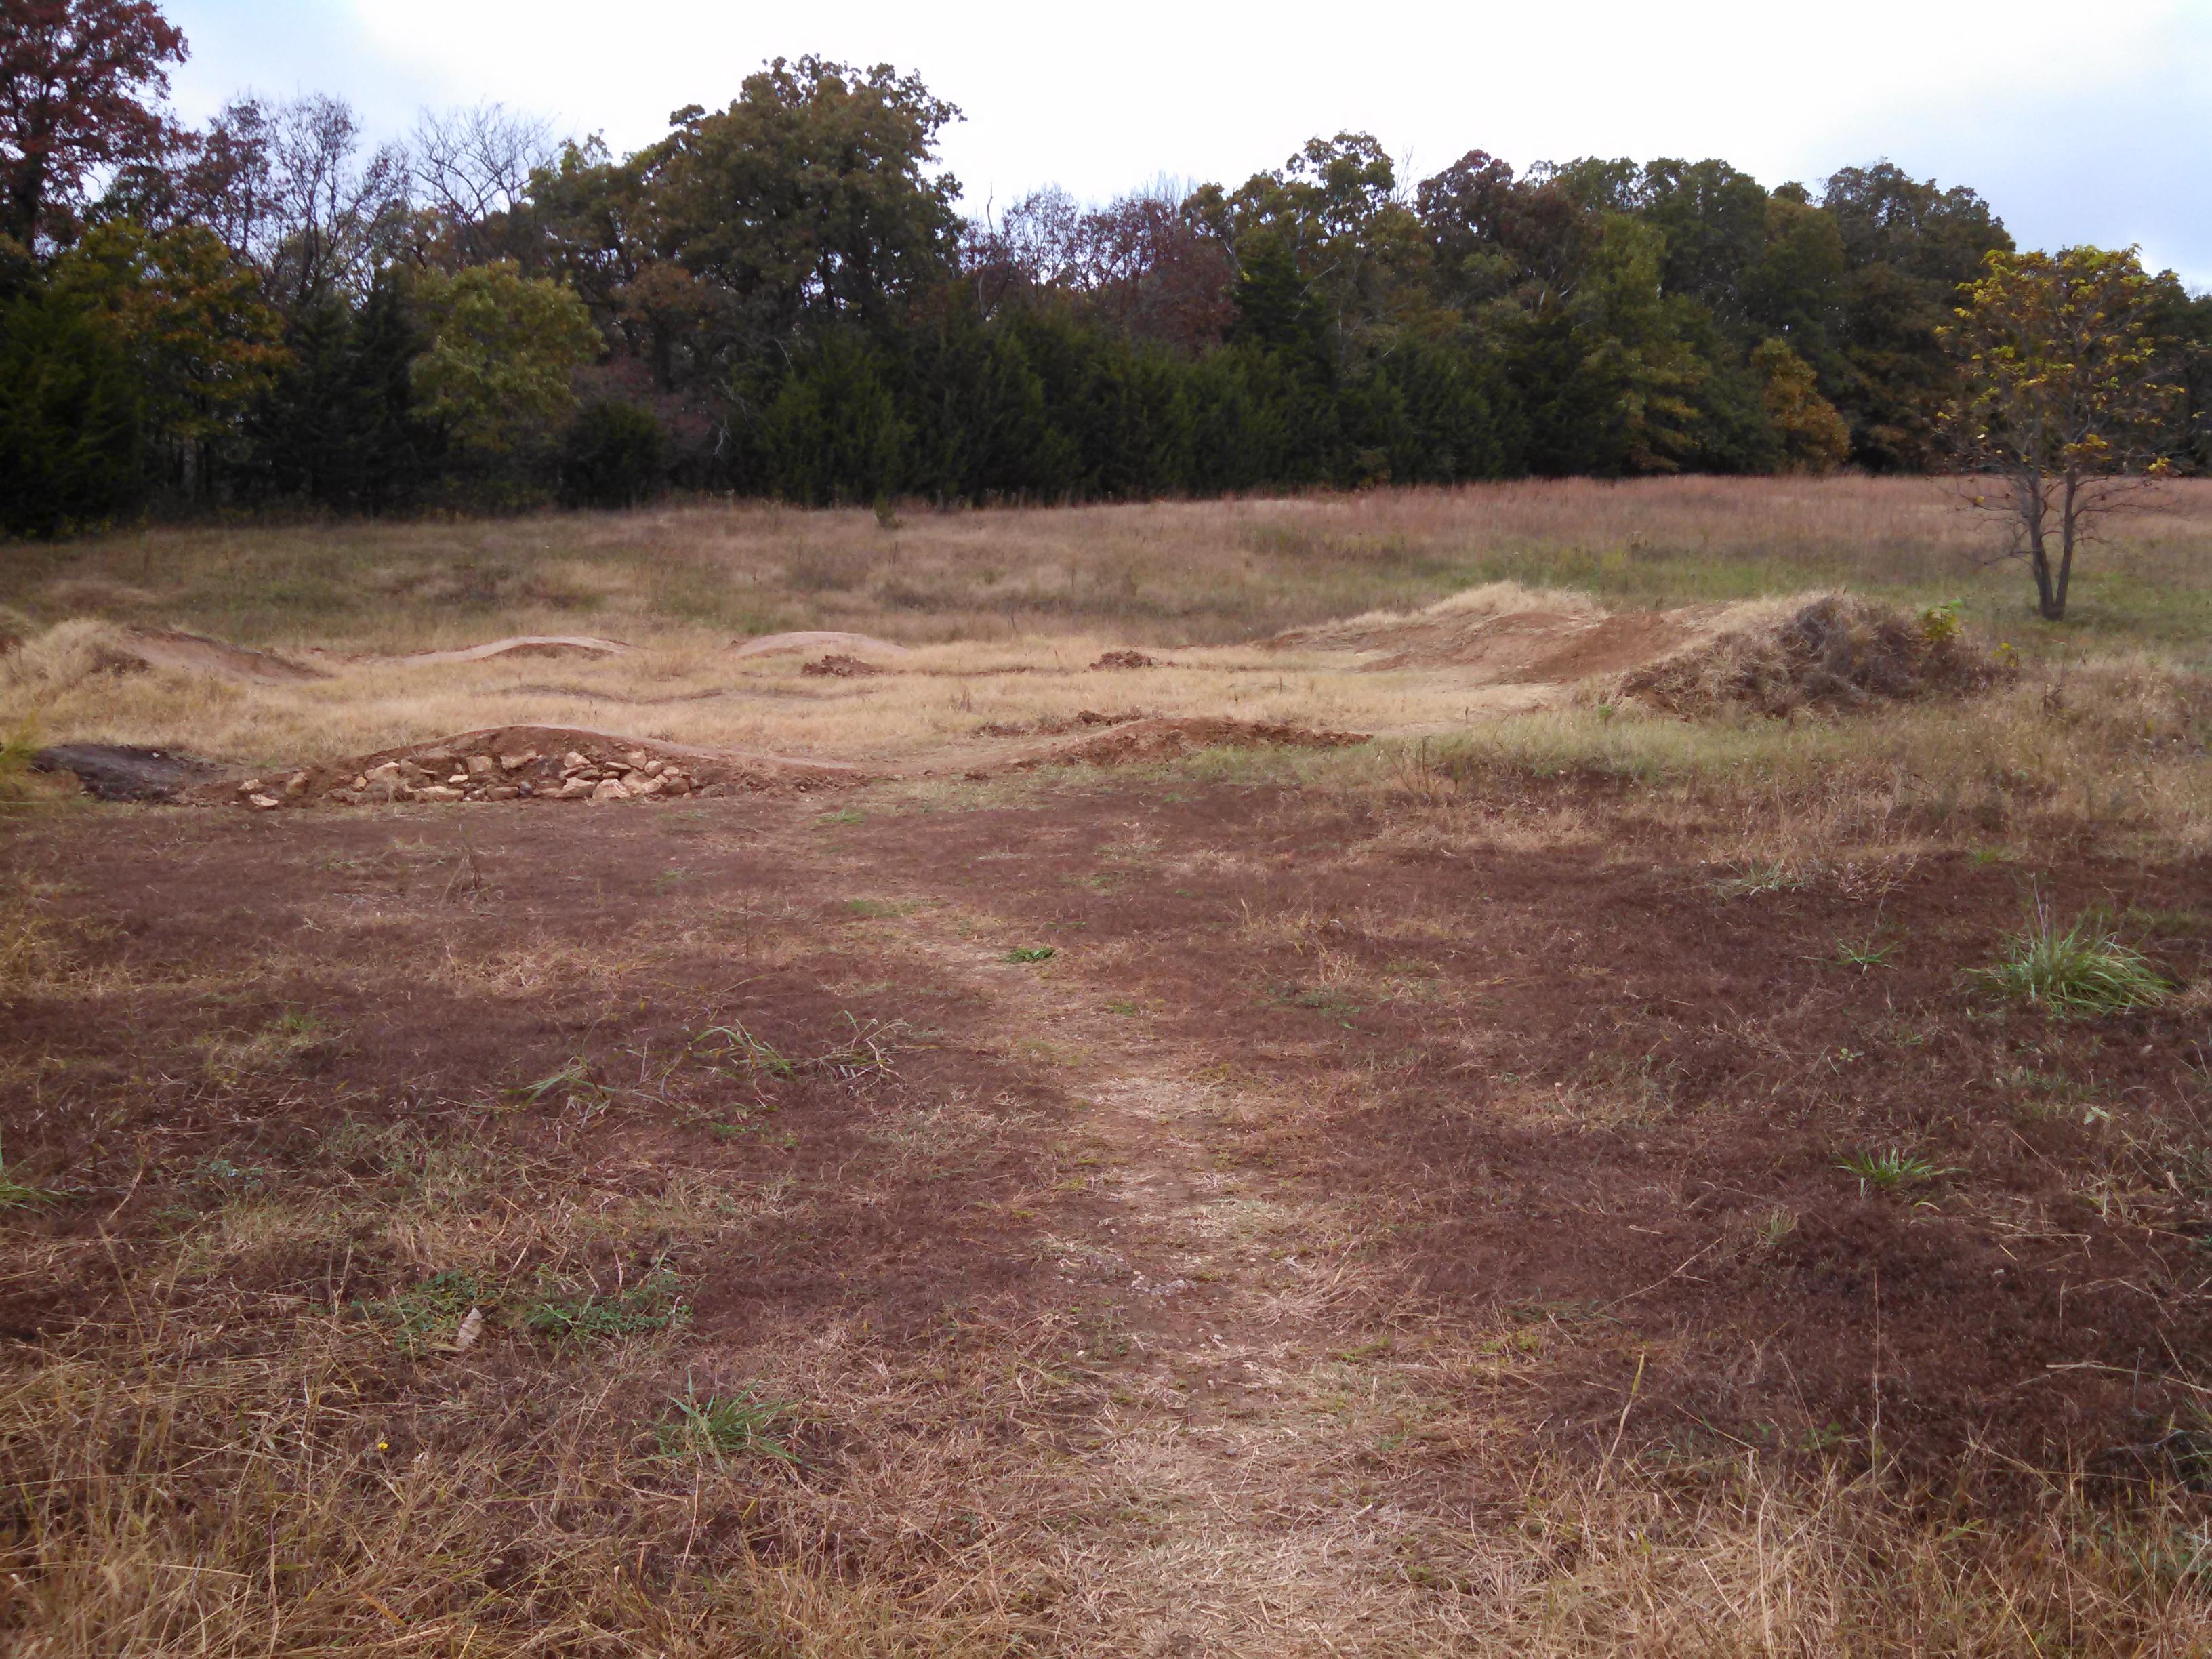 Shawnee Mission Park Pump Track | Get Outdoors Kansas